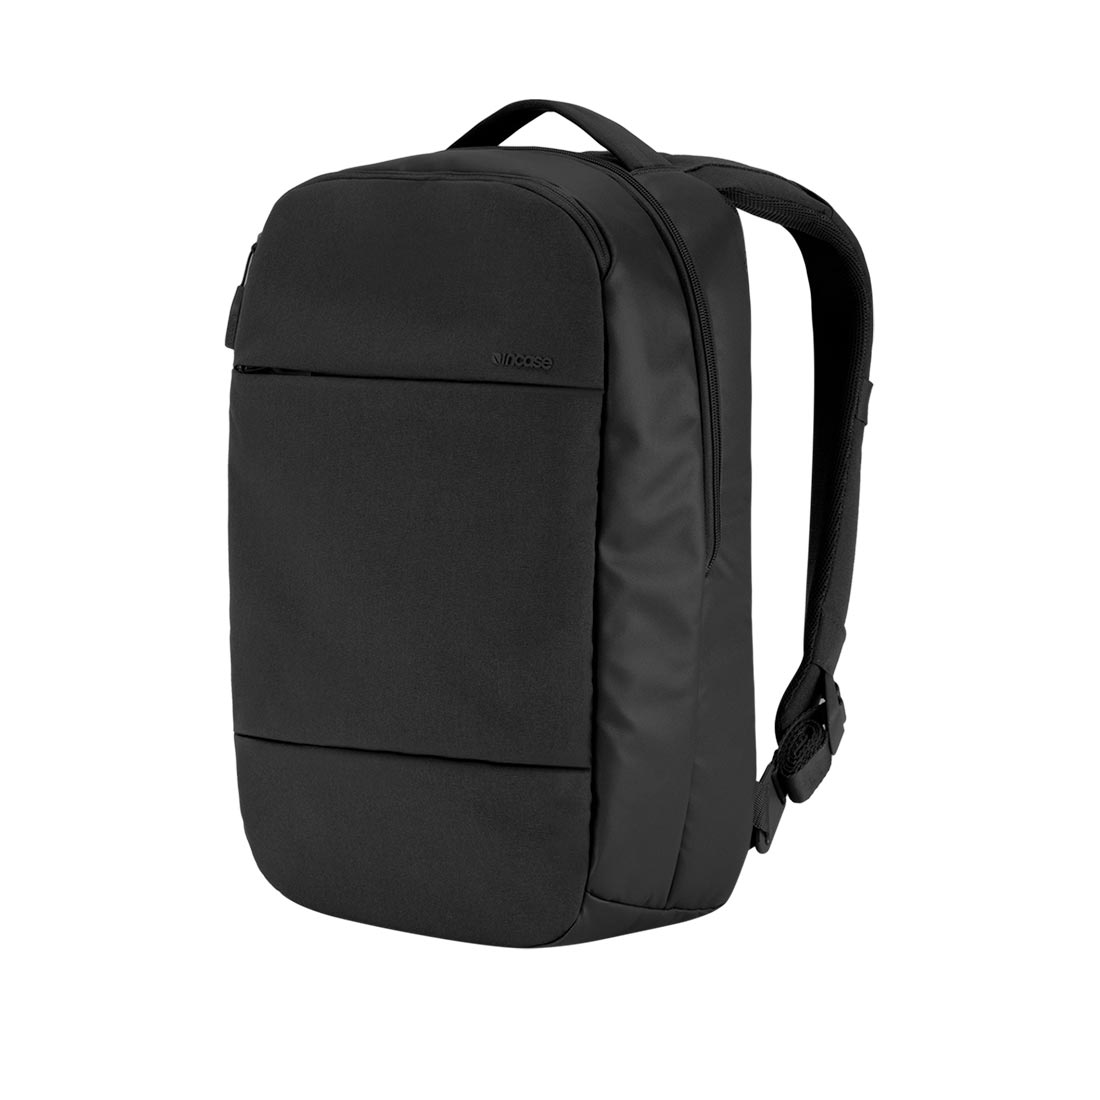 9cd320c67ee4 Incase City Compact 17.5L Backpack - Black